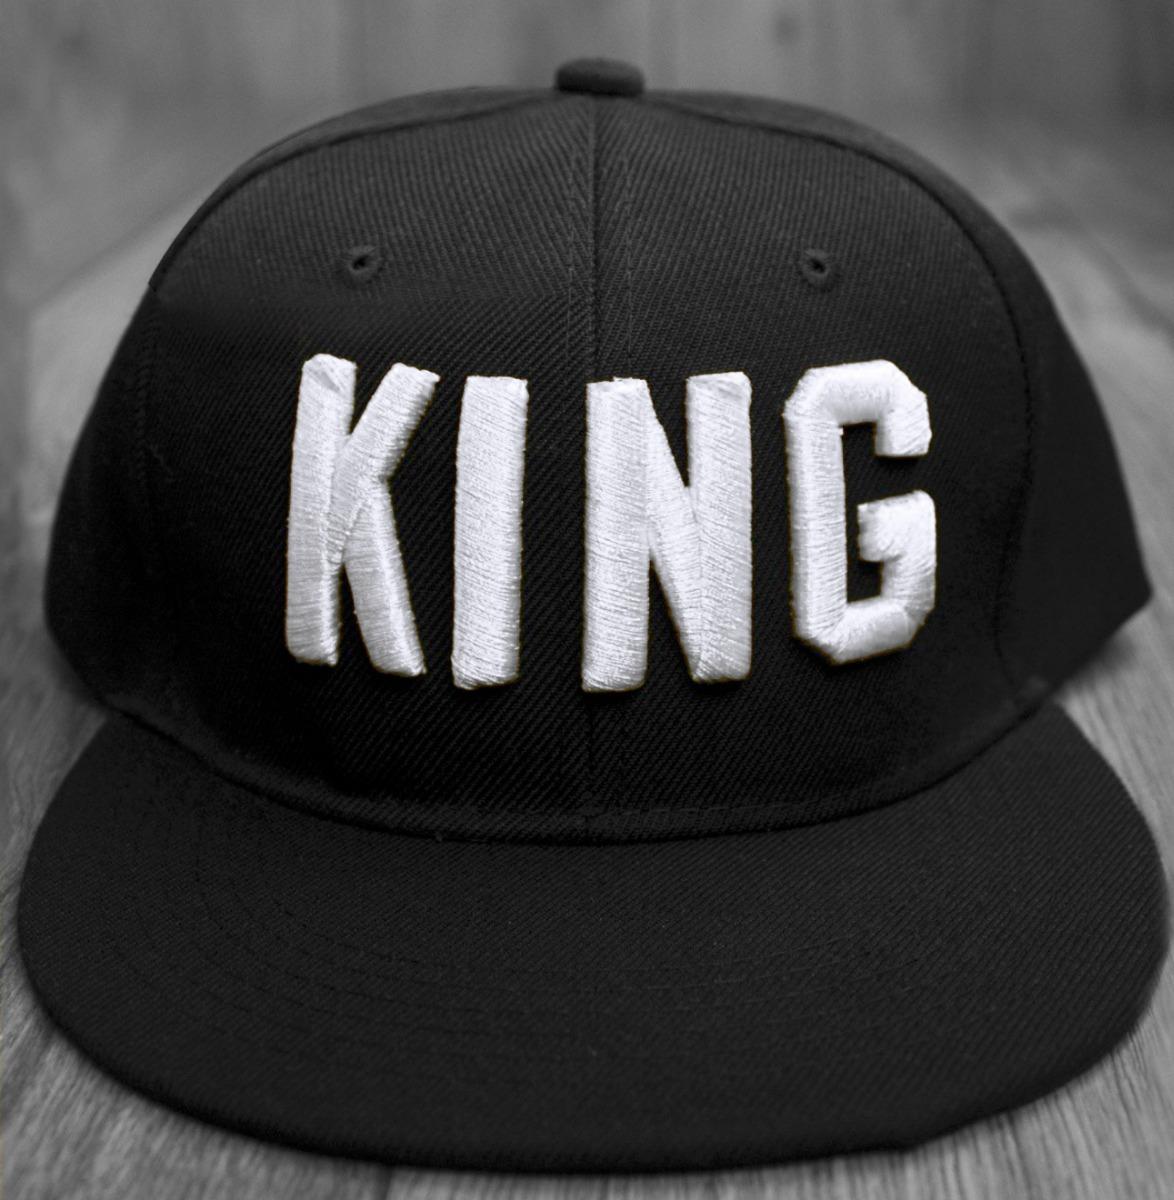 cbf59aa5a0037 Gorra King Rey Moda Hombre Snapback Bordado San Valentin -   200.00 ...